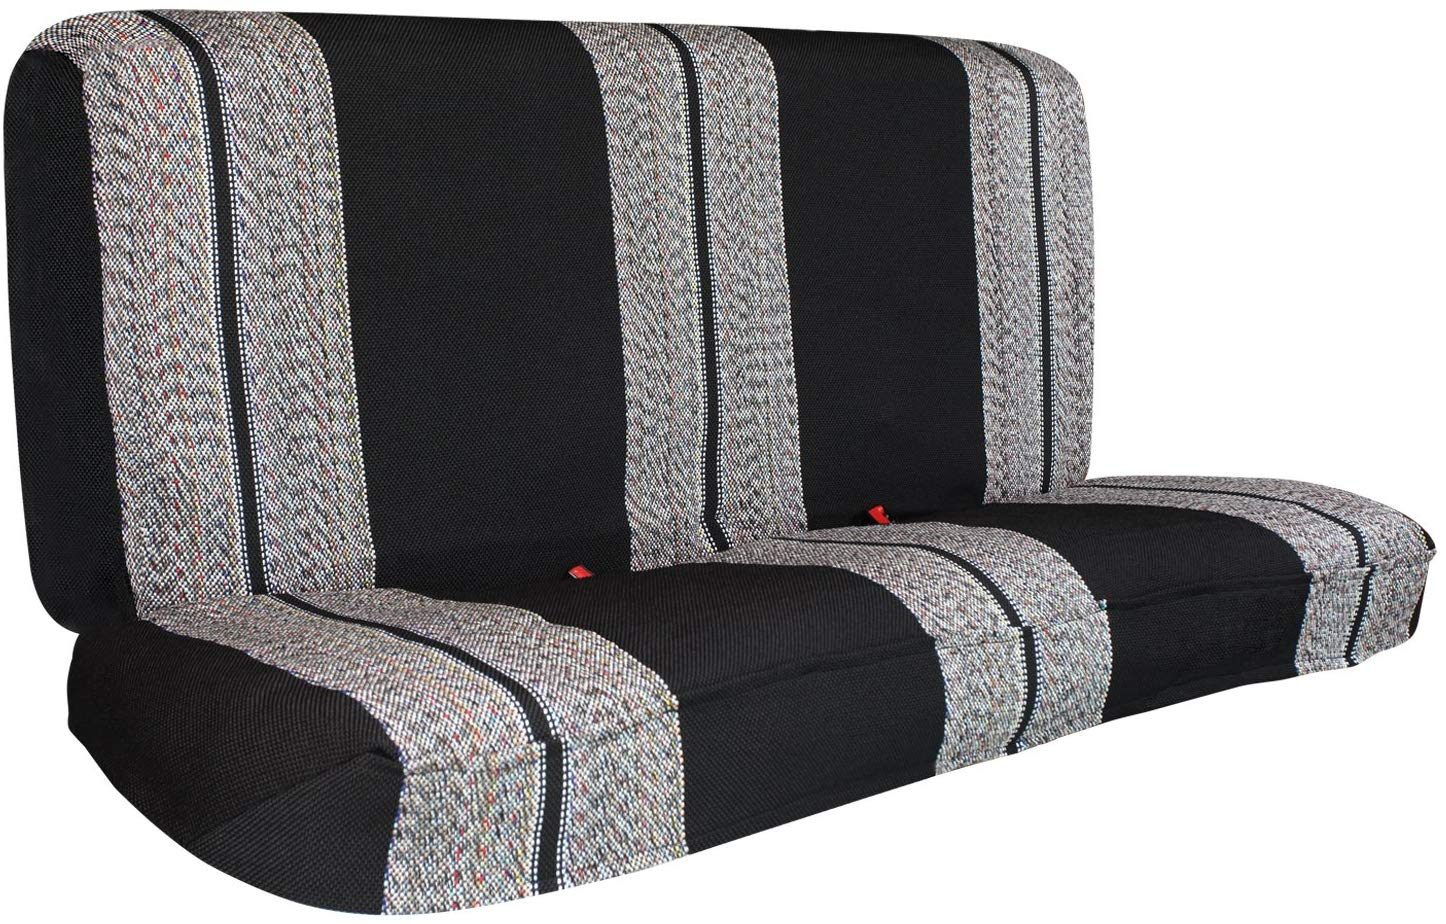 Blanket Truck Bench Seat Cover 1pc Walmart Com